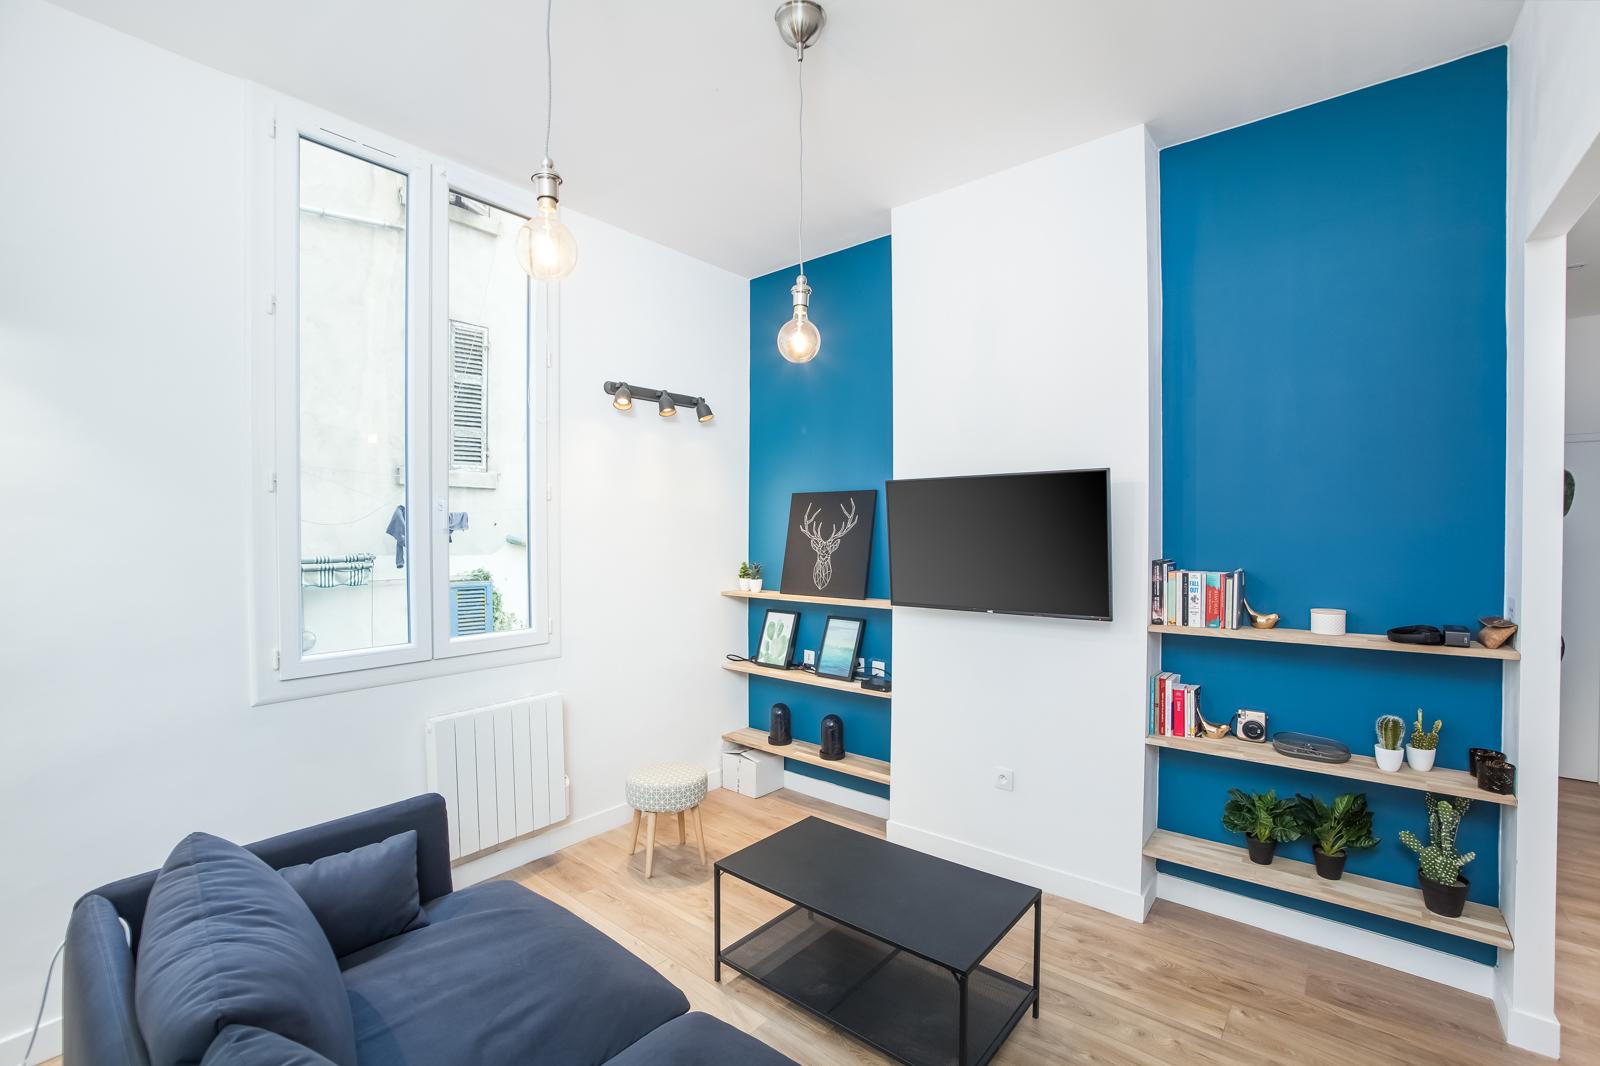 Novaclem - Salon 2 Coloc Labadie - Investissement Marseille